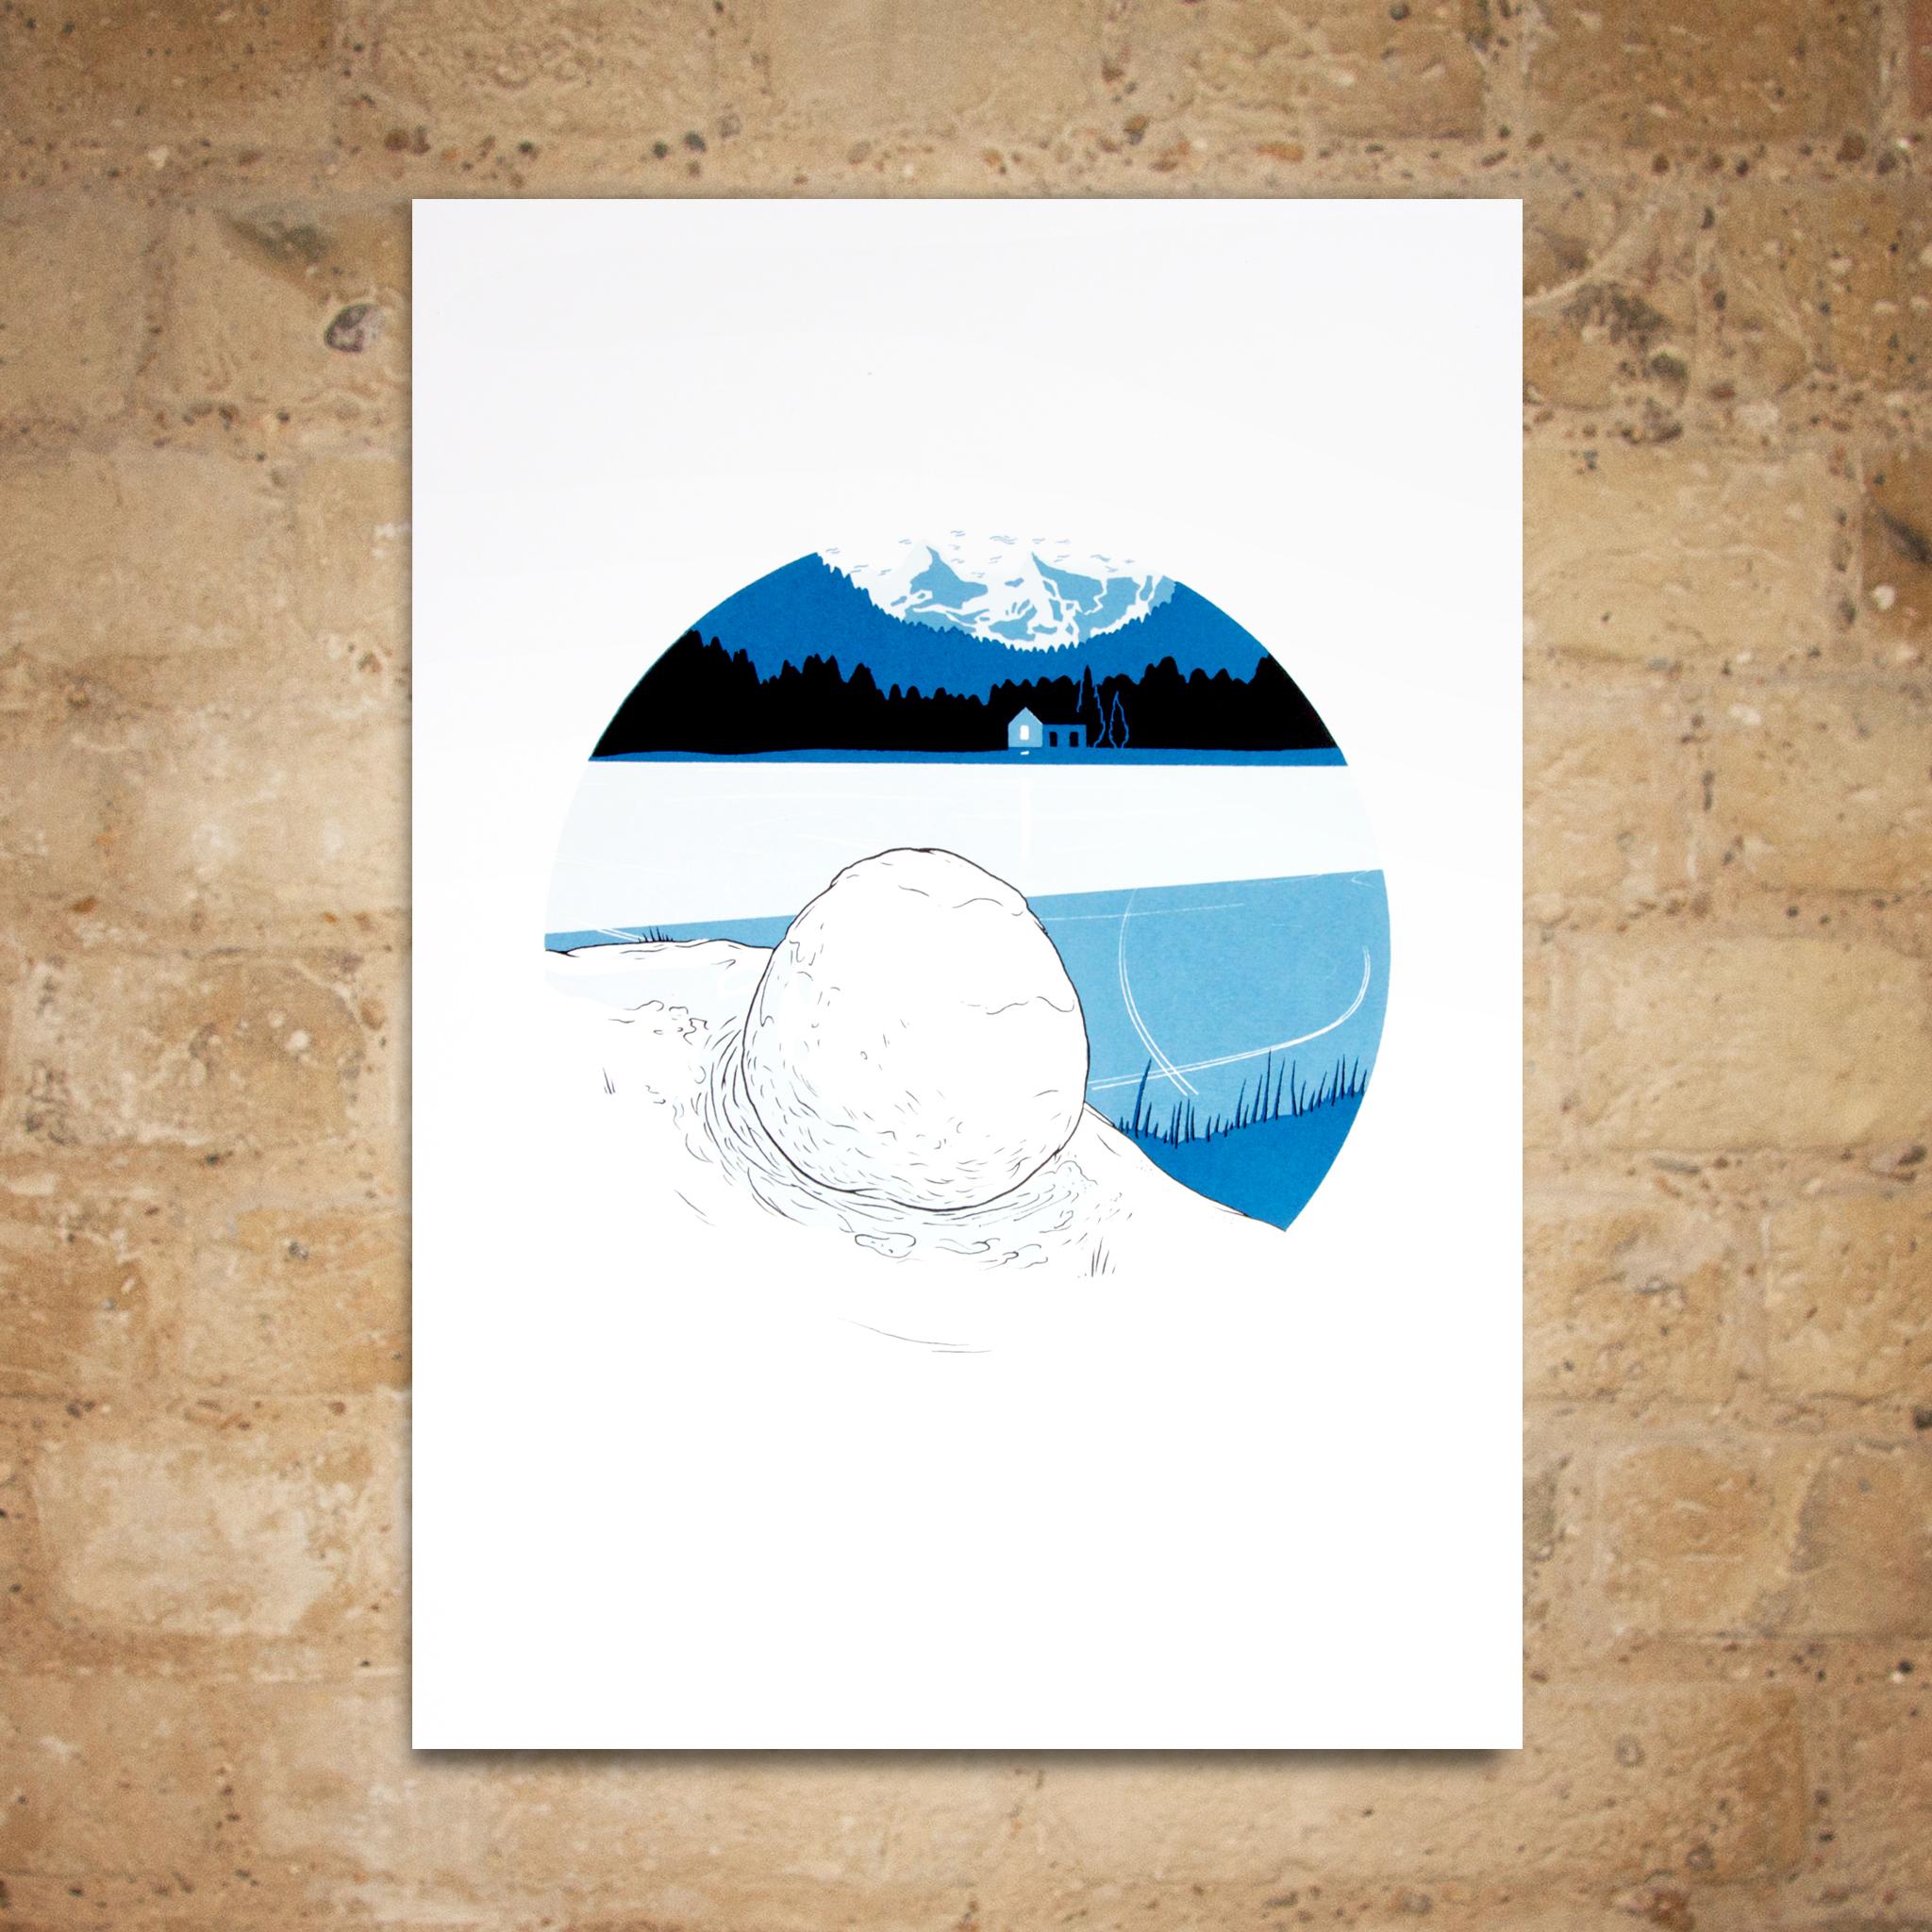 Snowball Print by Robert Fresson